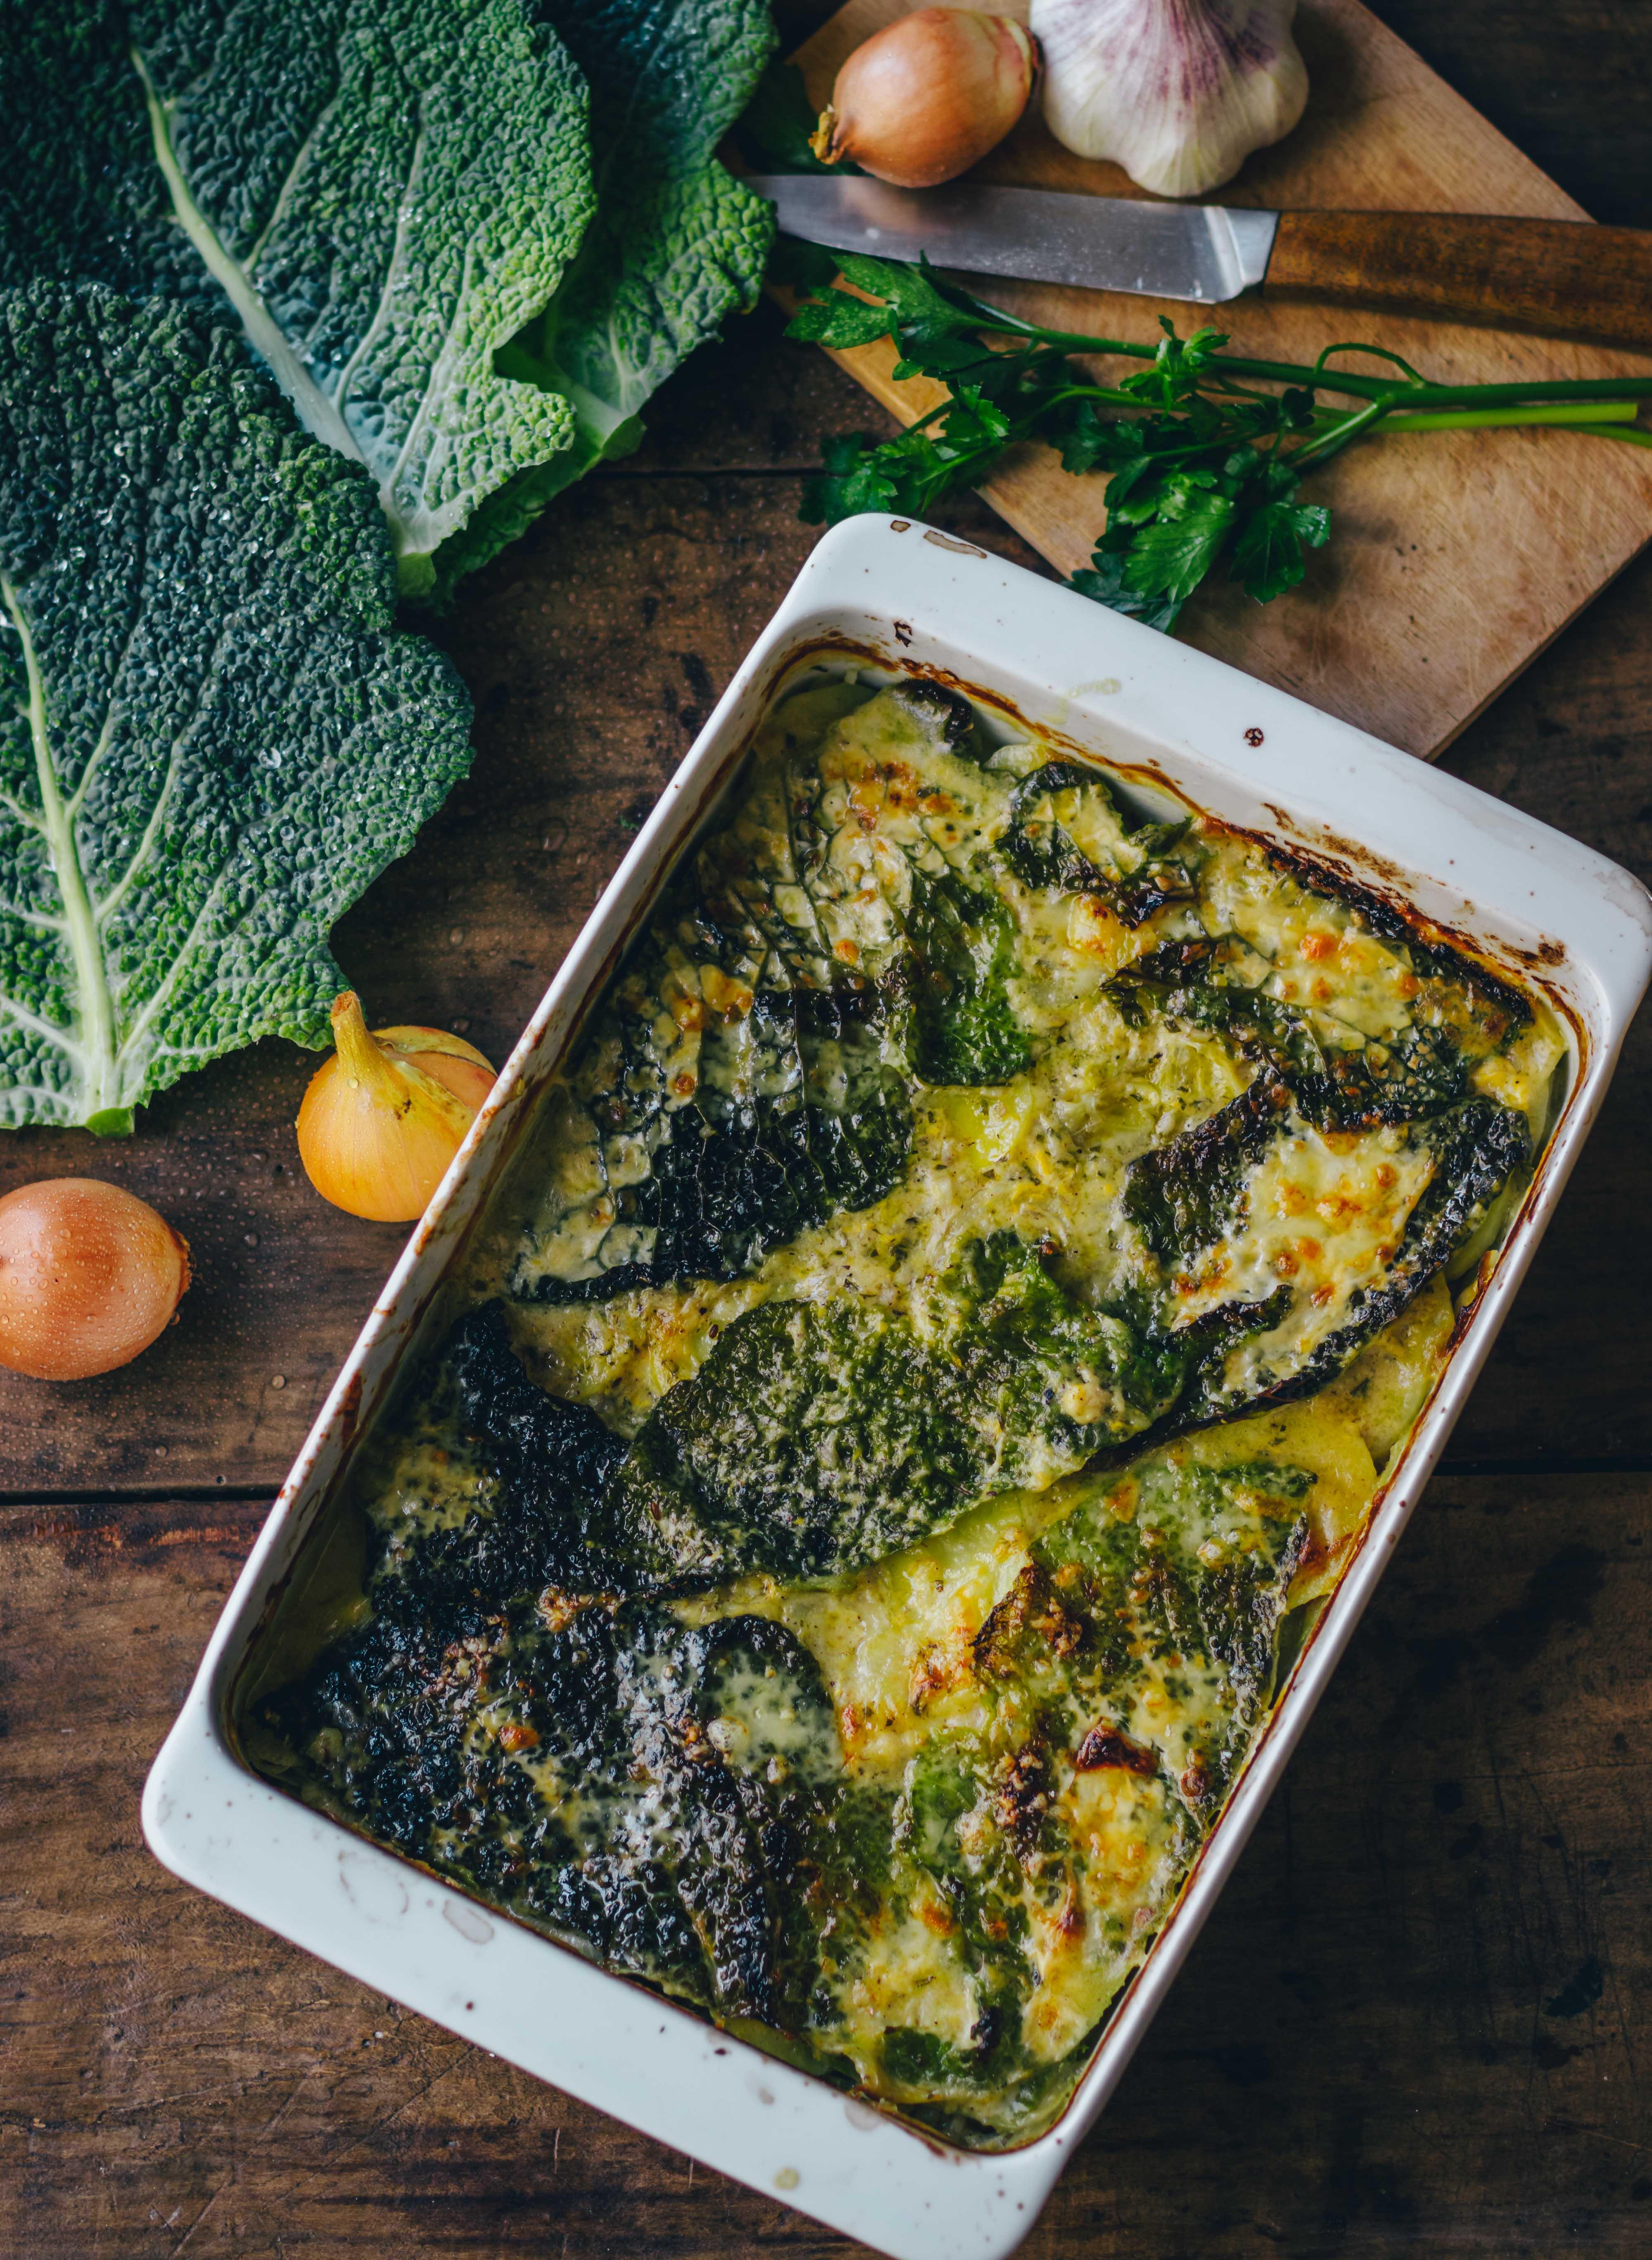 Savoy Cabbage Casserole Easy Oven Baked Recipe Klara S Life